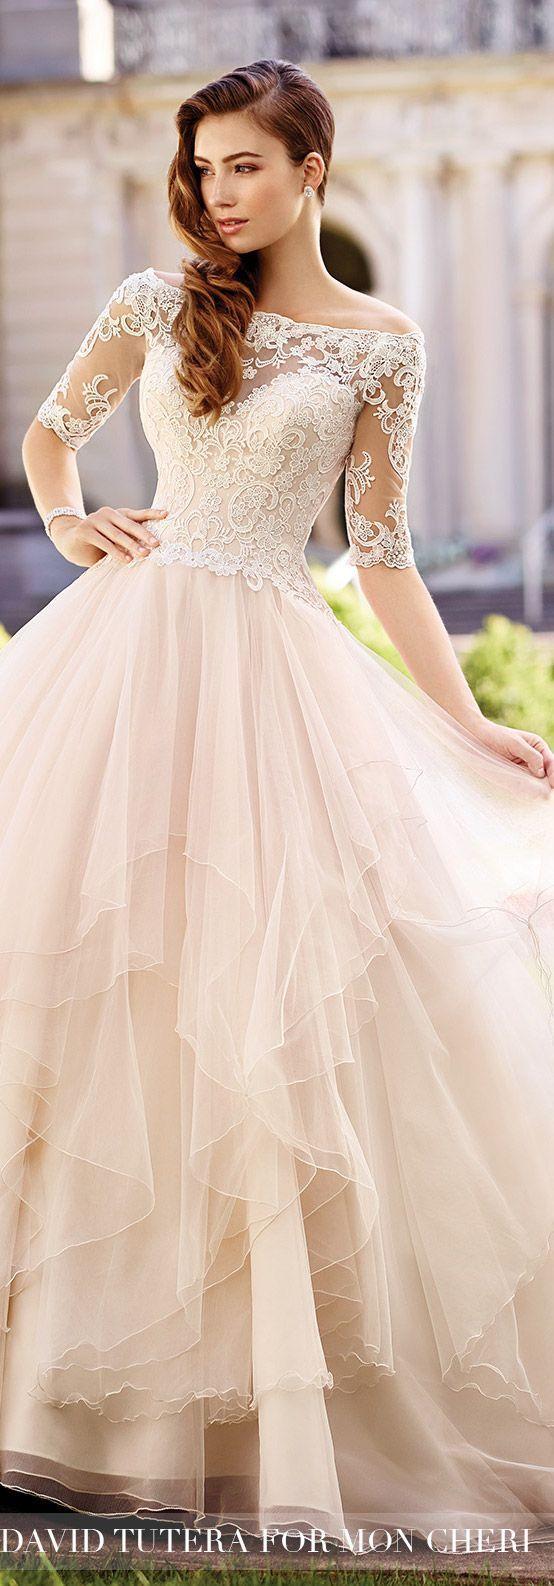 Wedding dresses springfield mo   best Wedding Dresses images on Pinterest  Wedding dressses